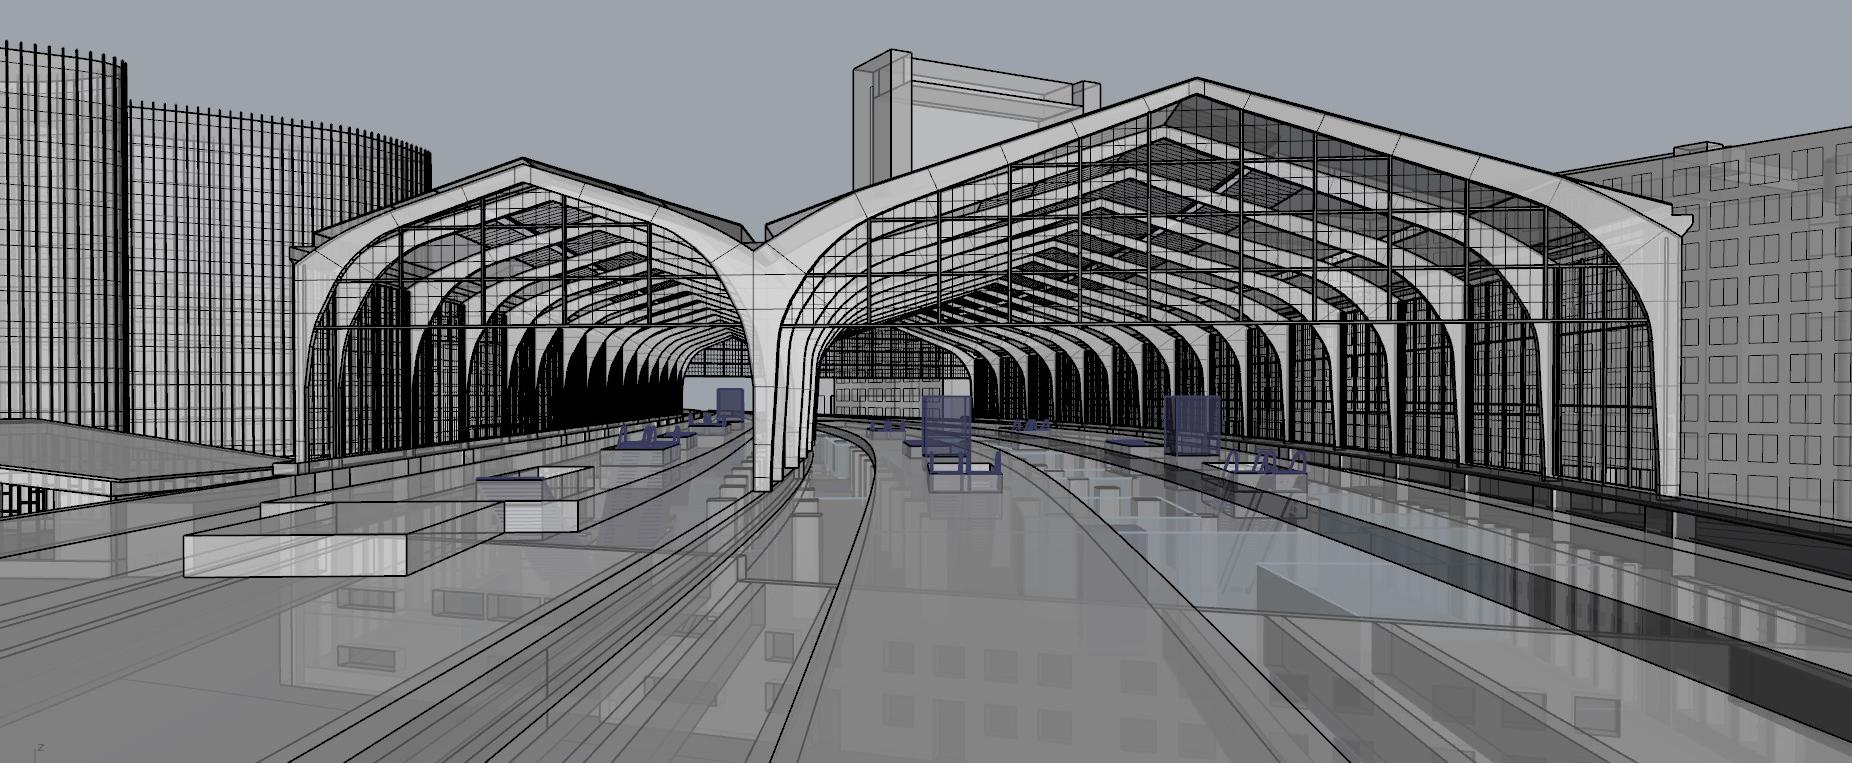 Architecture dissertations in progress